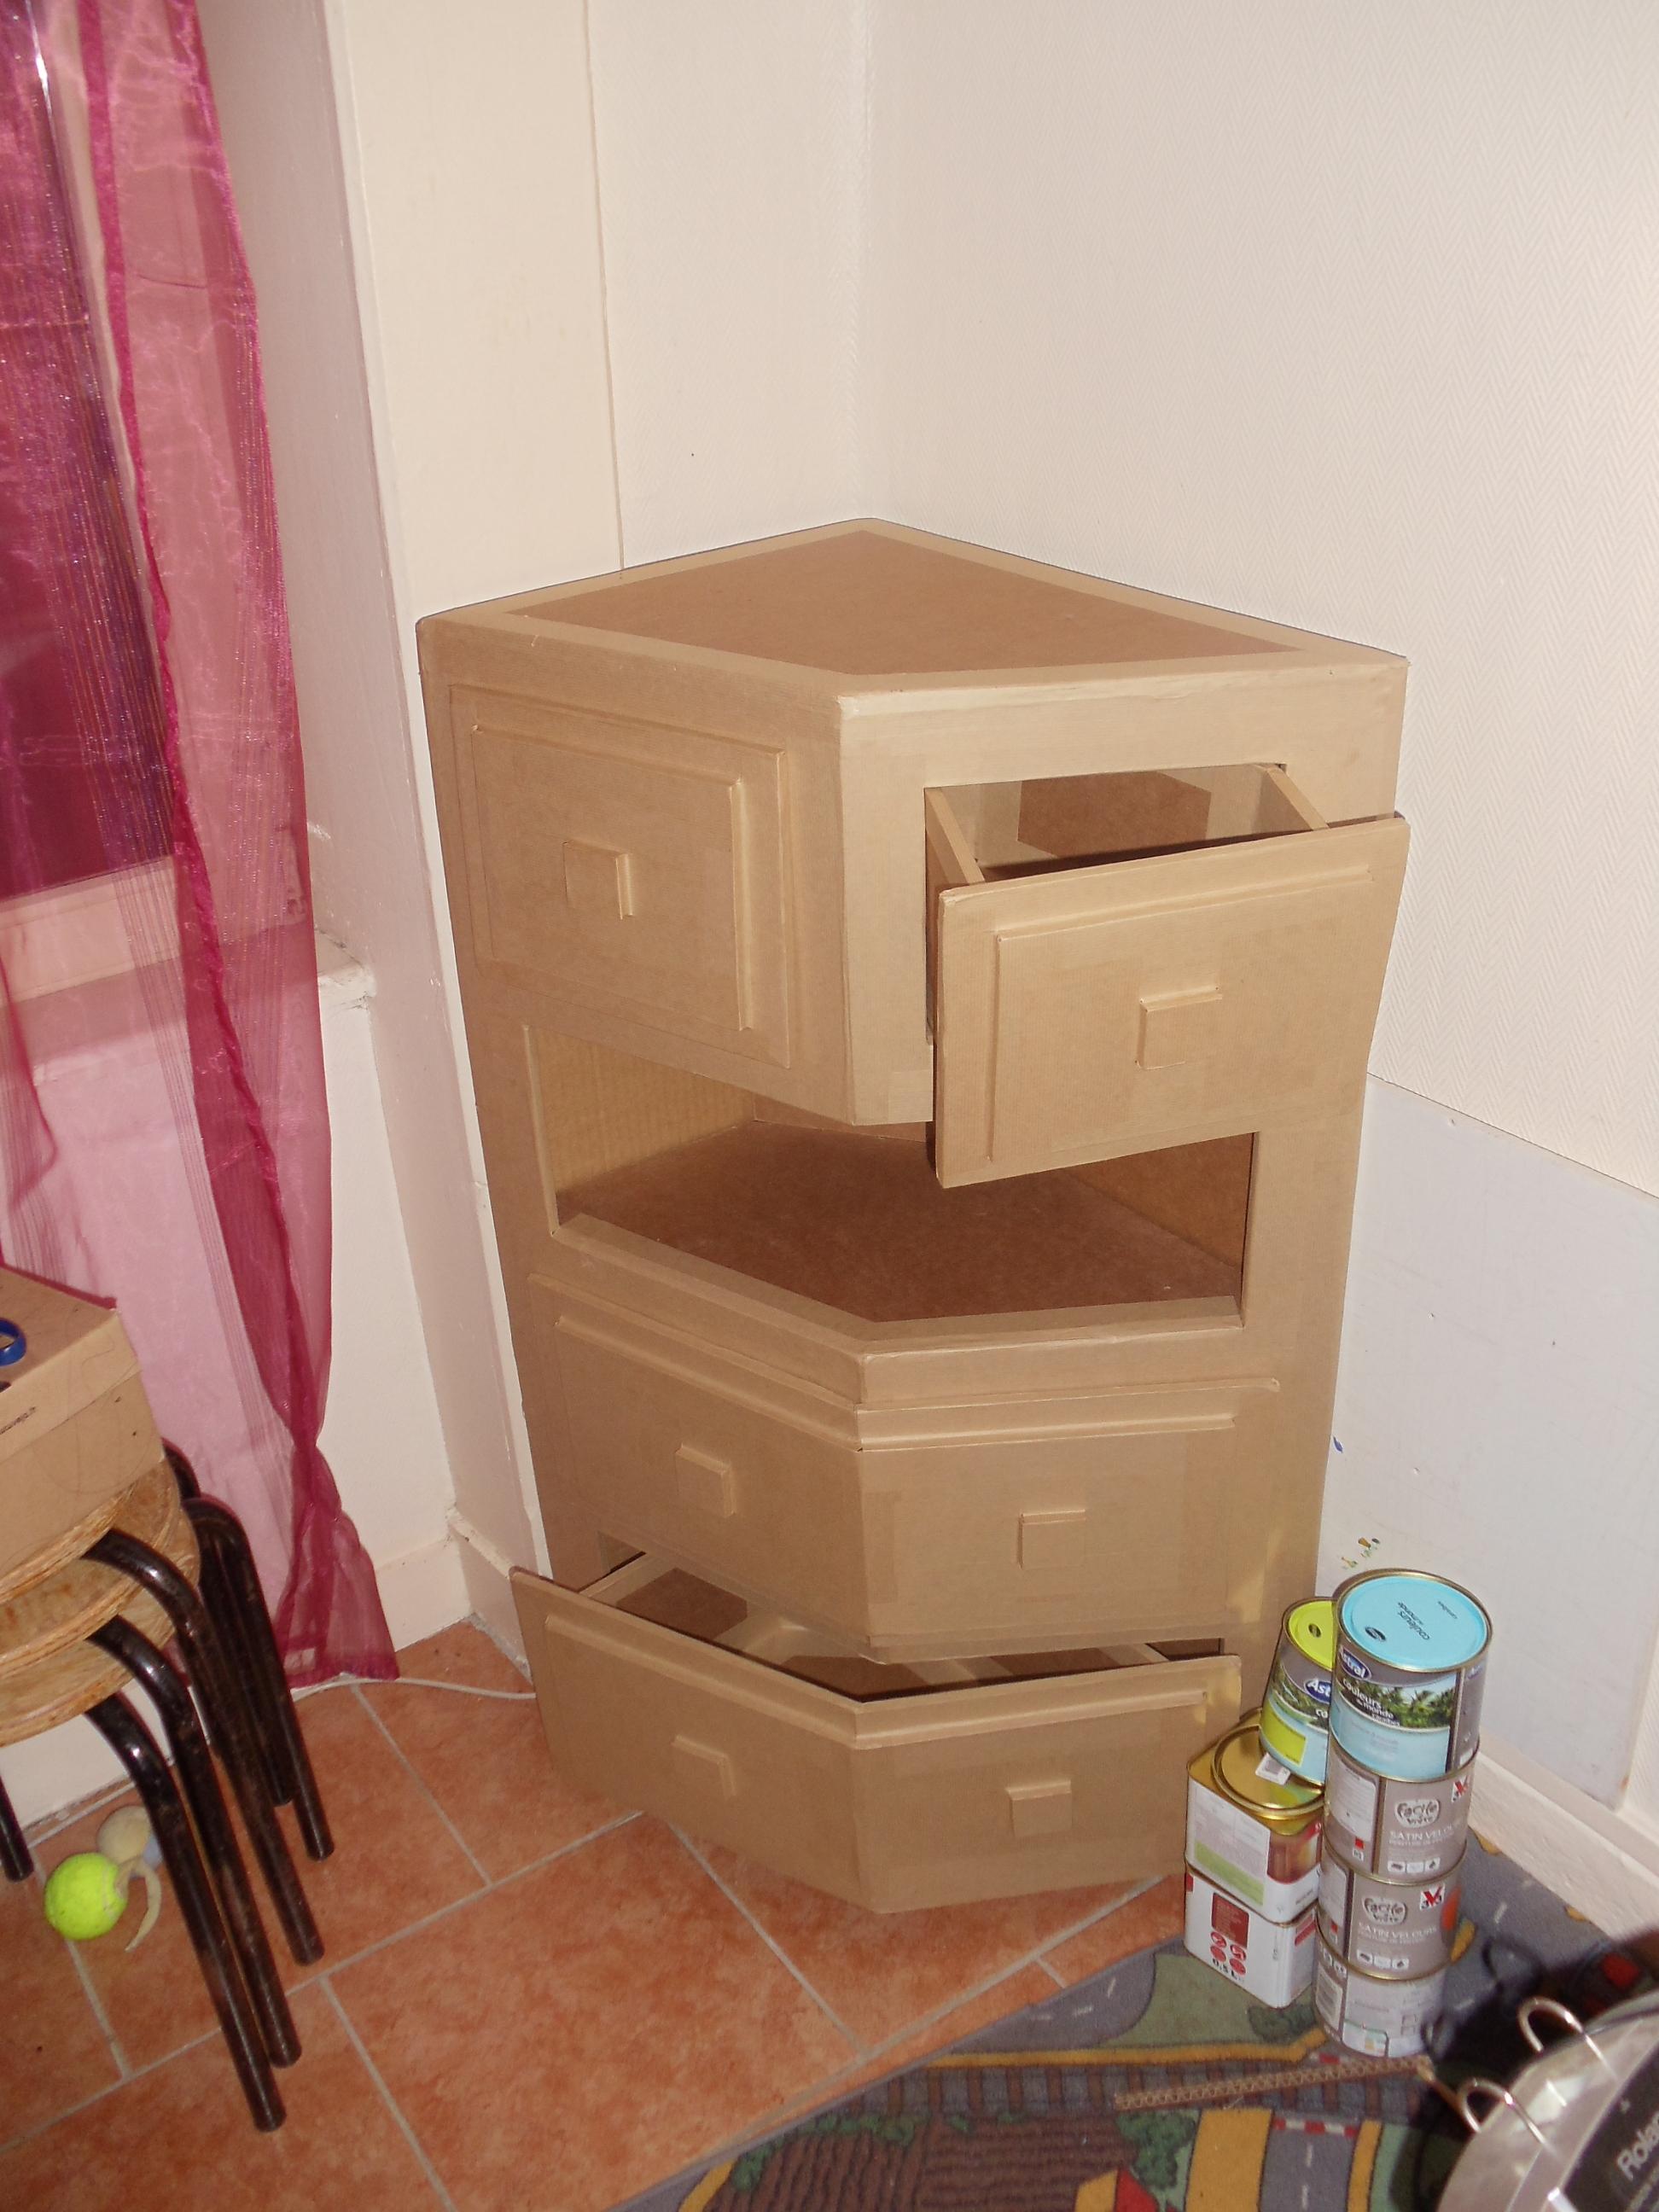 Fabriquer Une Bibliothèque En Carton meuble en carton d'angle avec tiroirs : david mercereau